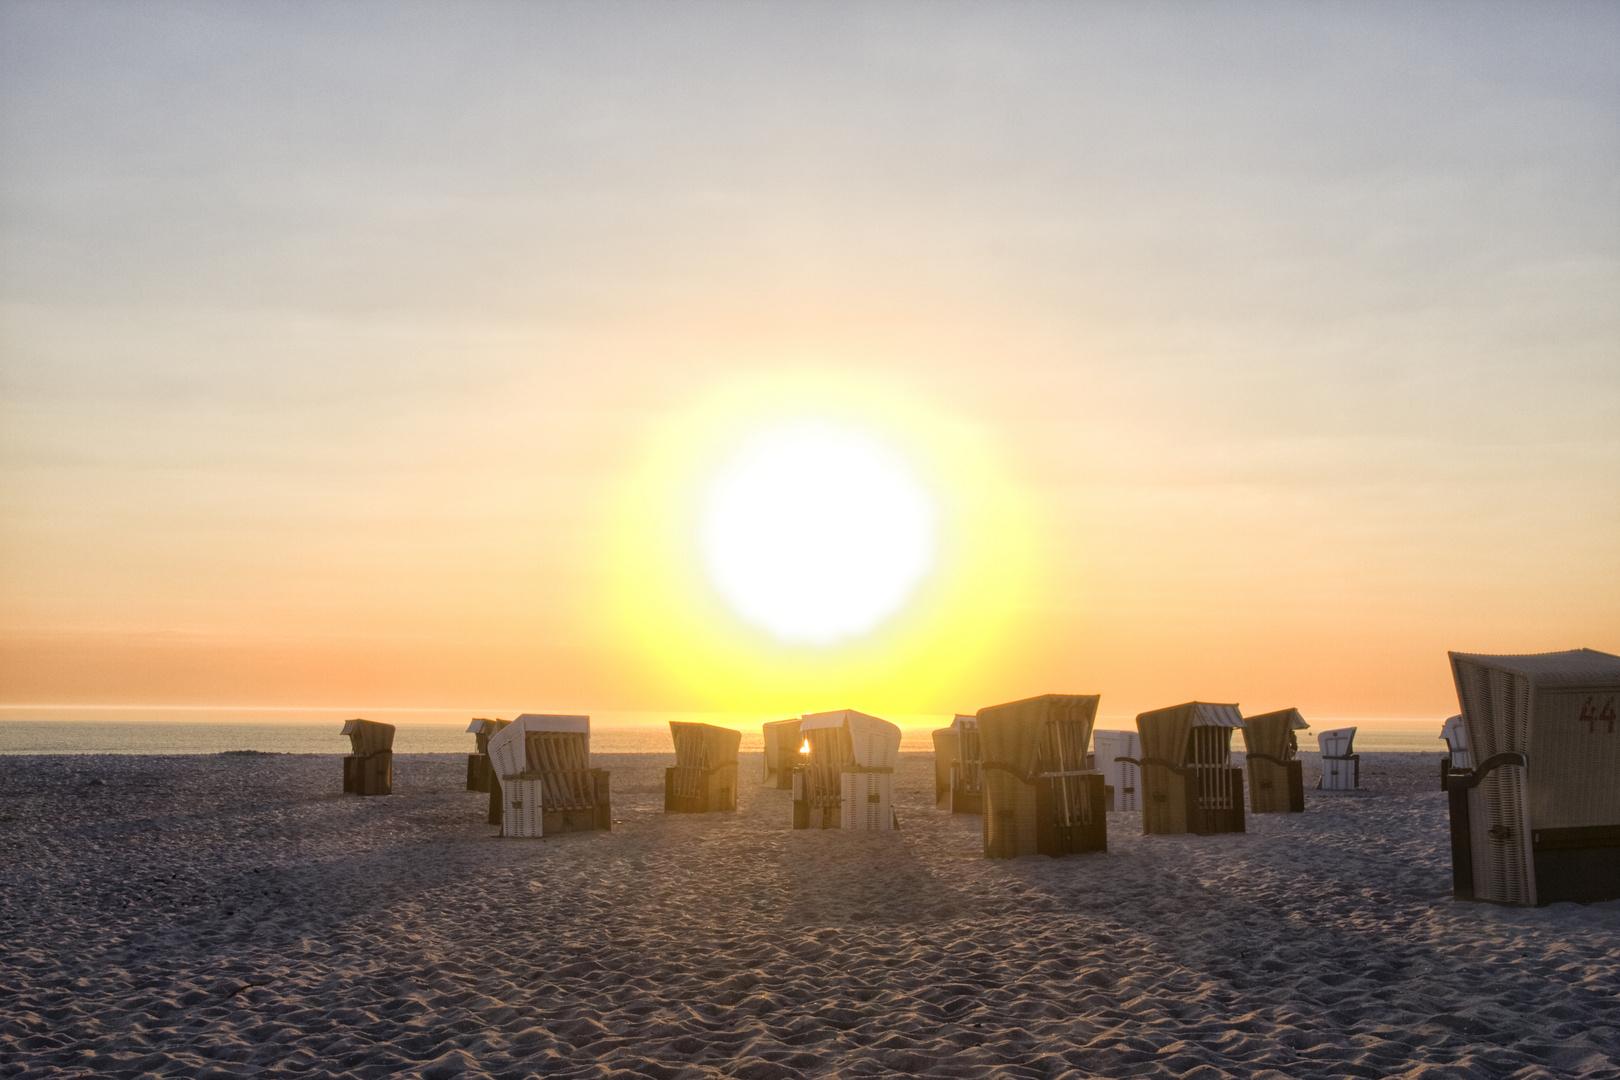 Sonnenaufgang Strand Prerow 2014